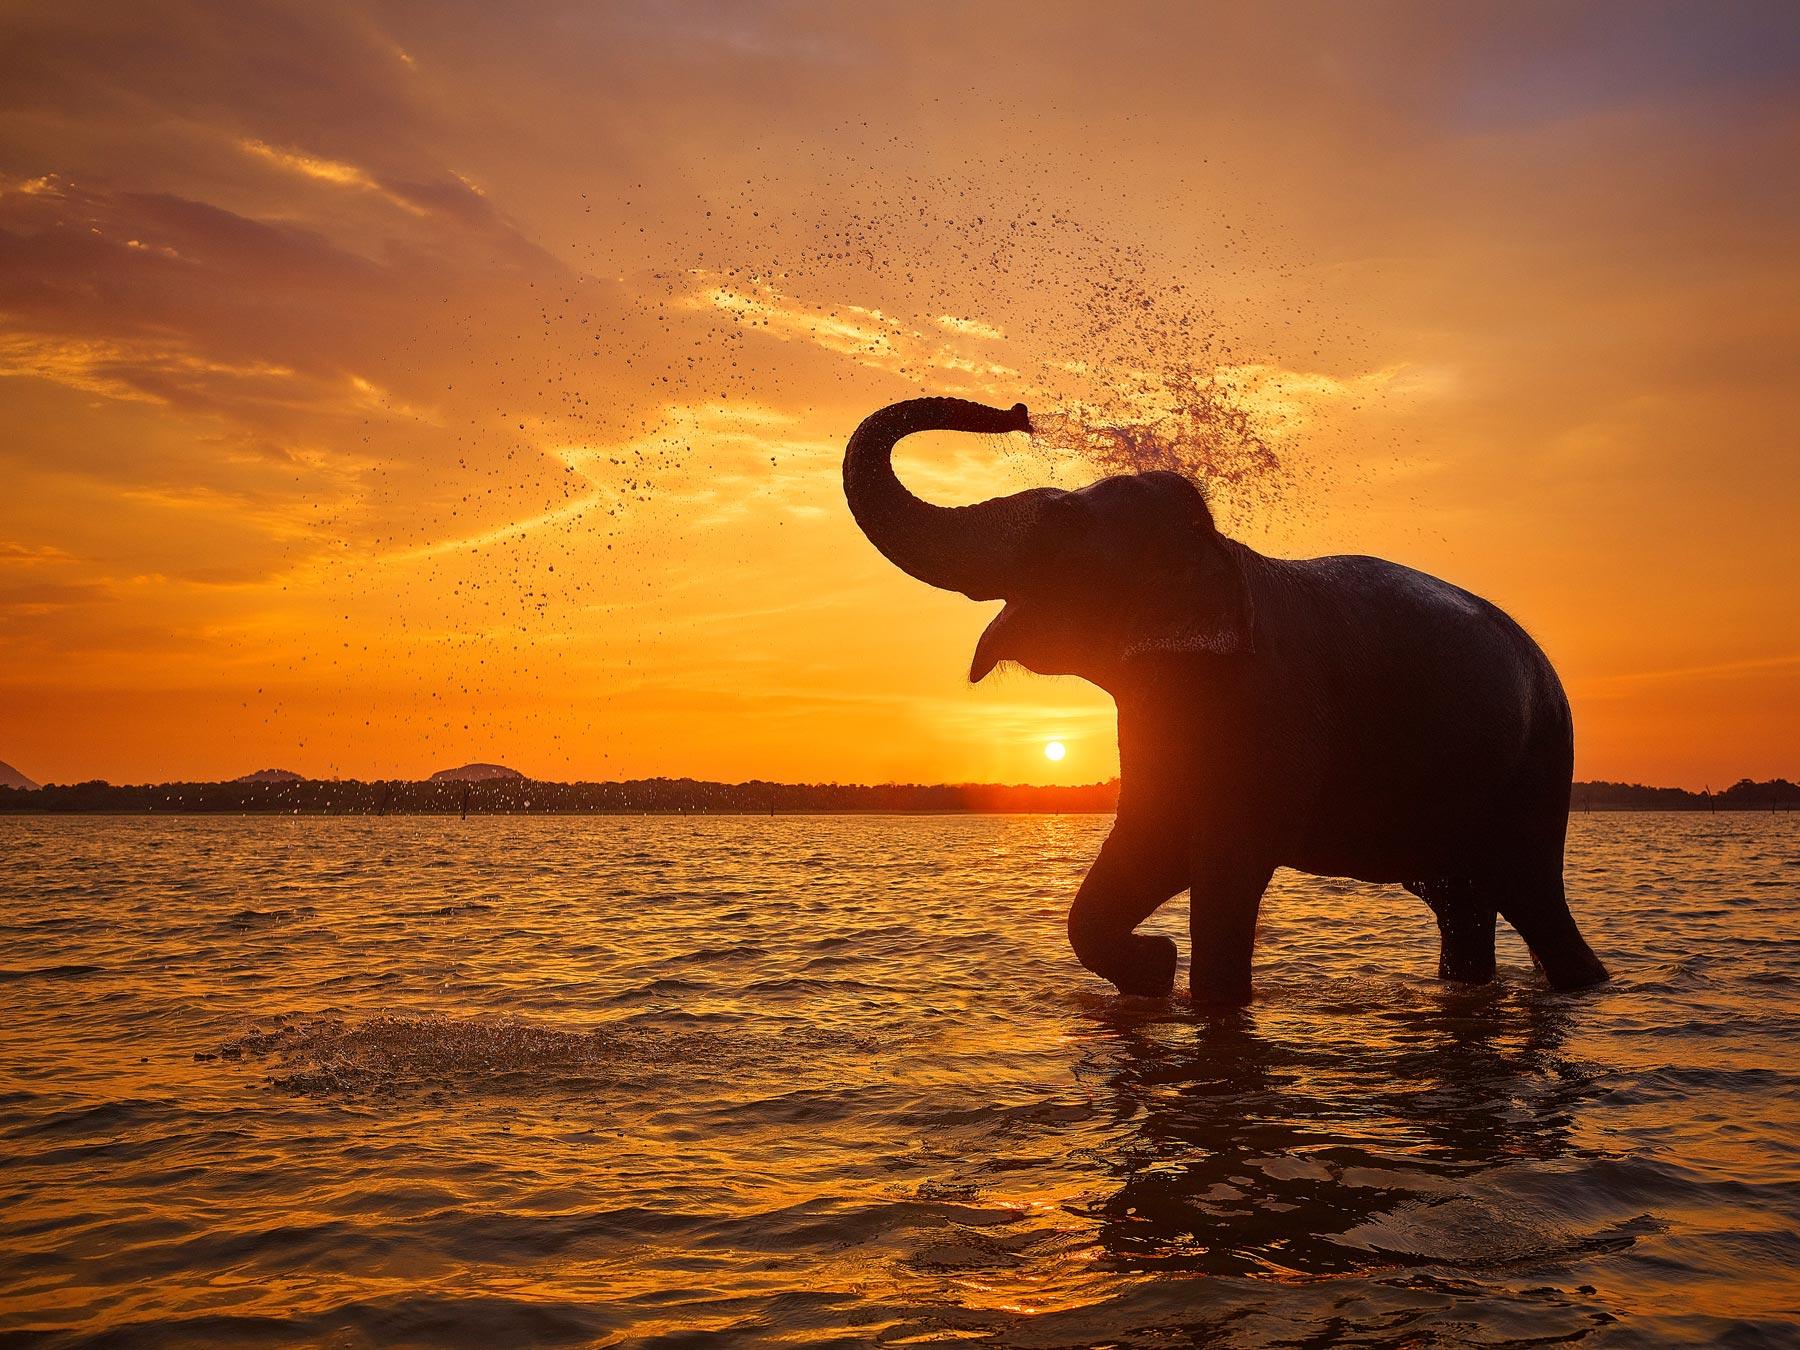 Monica the elephant enjoying a late afternoon bath in Kandalama Reservoir, Sri Lanka.